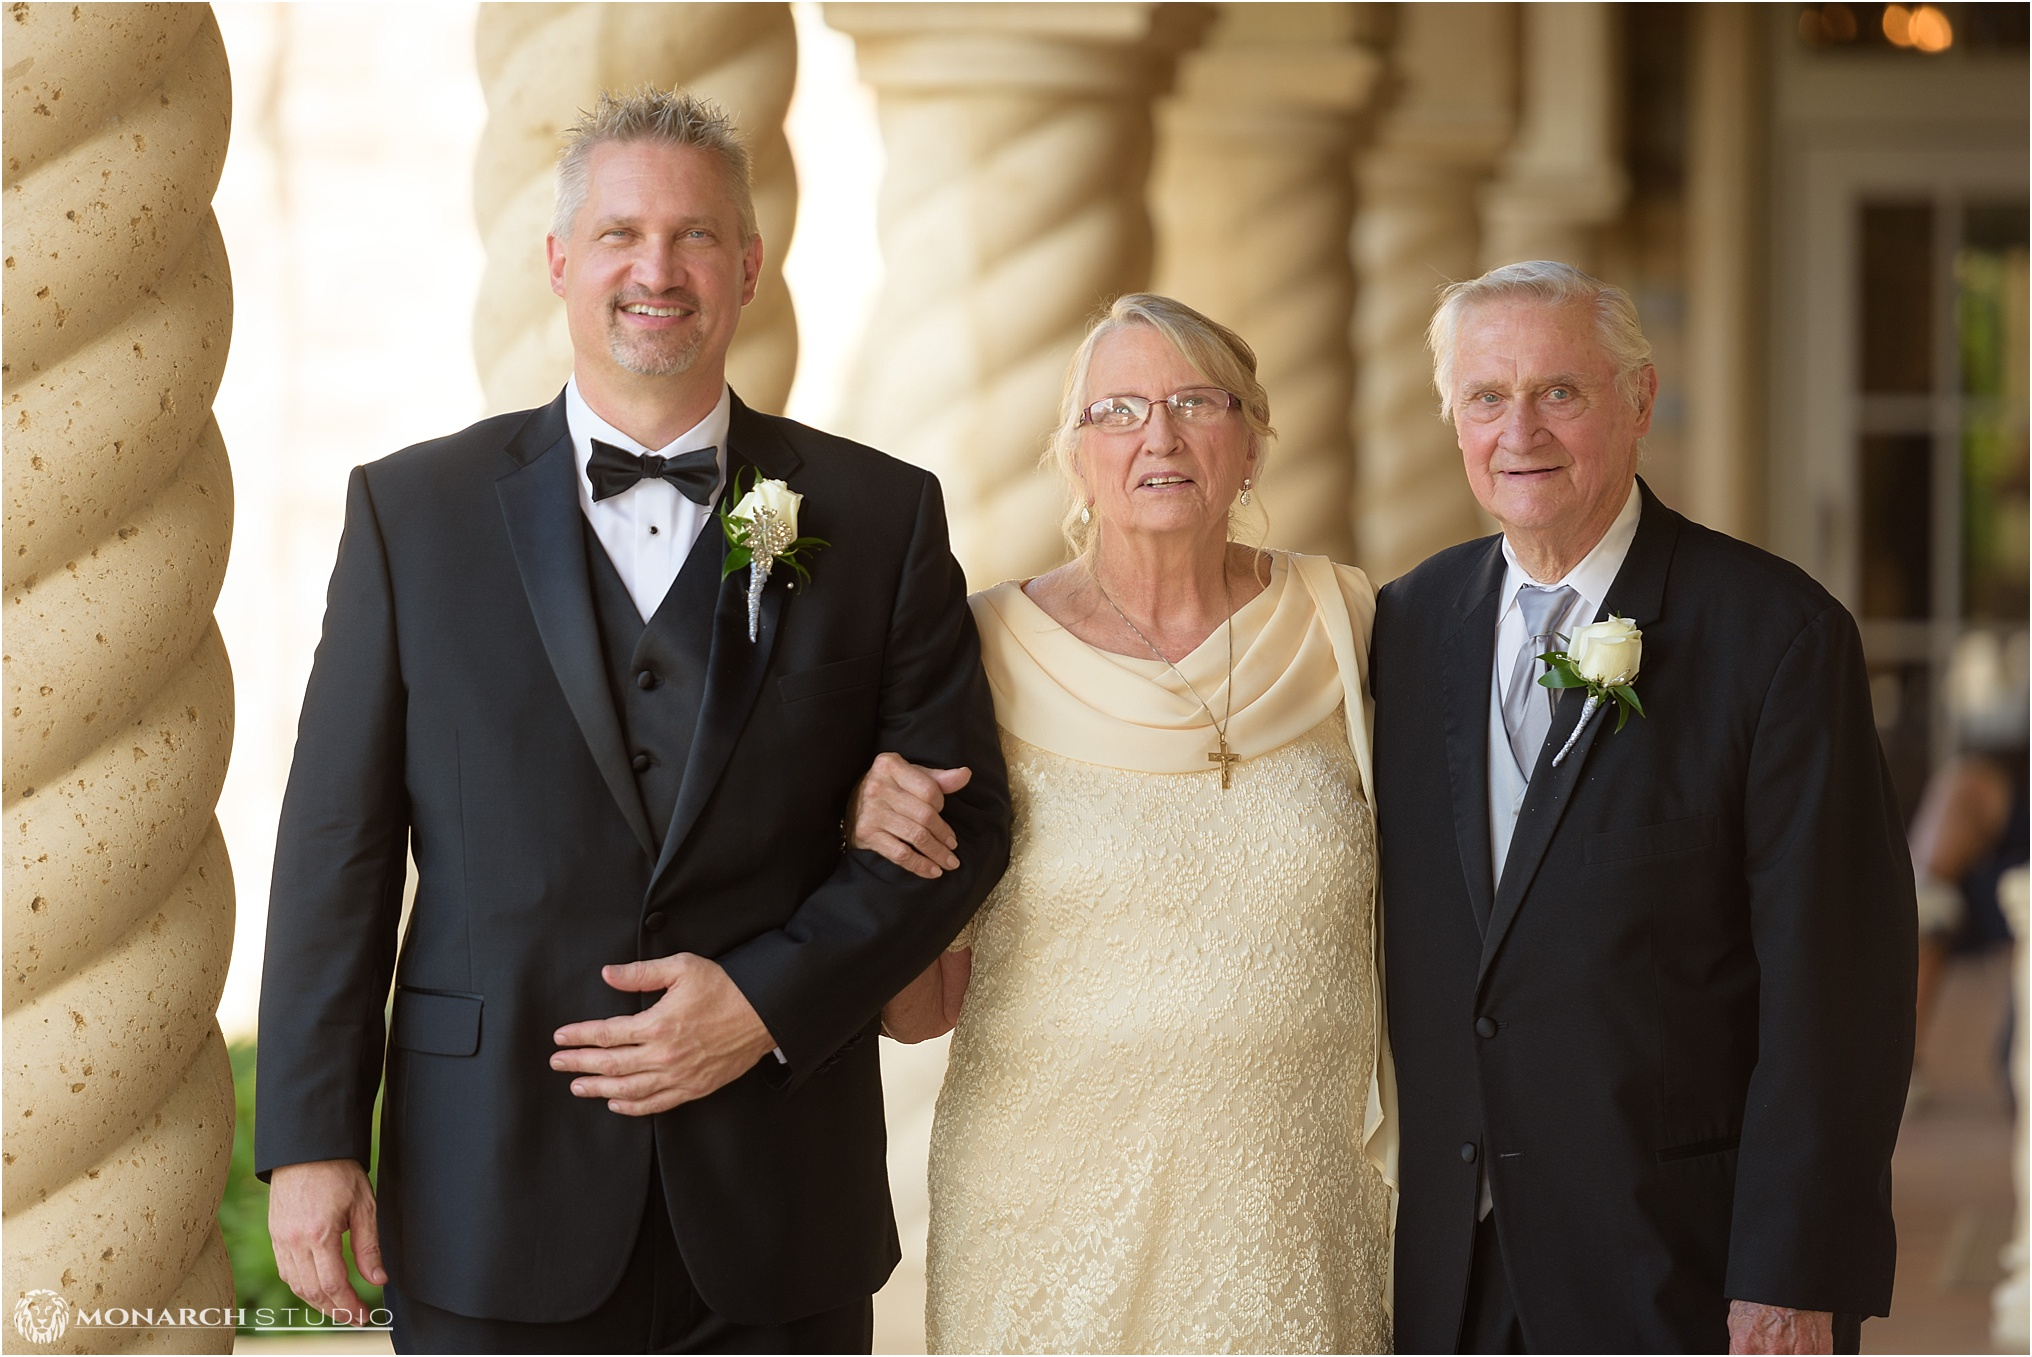 ponte-vedra-wedding-photographer-tpc032.jpg